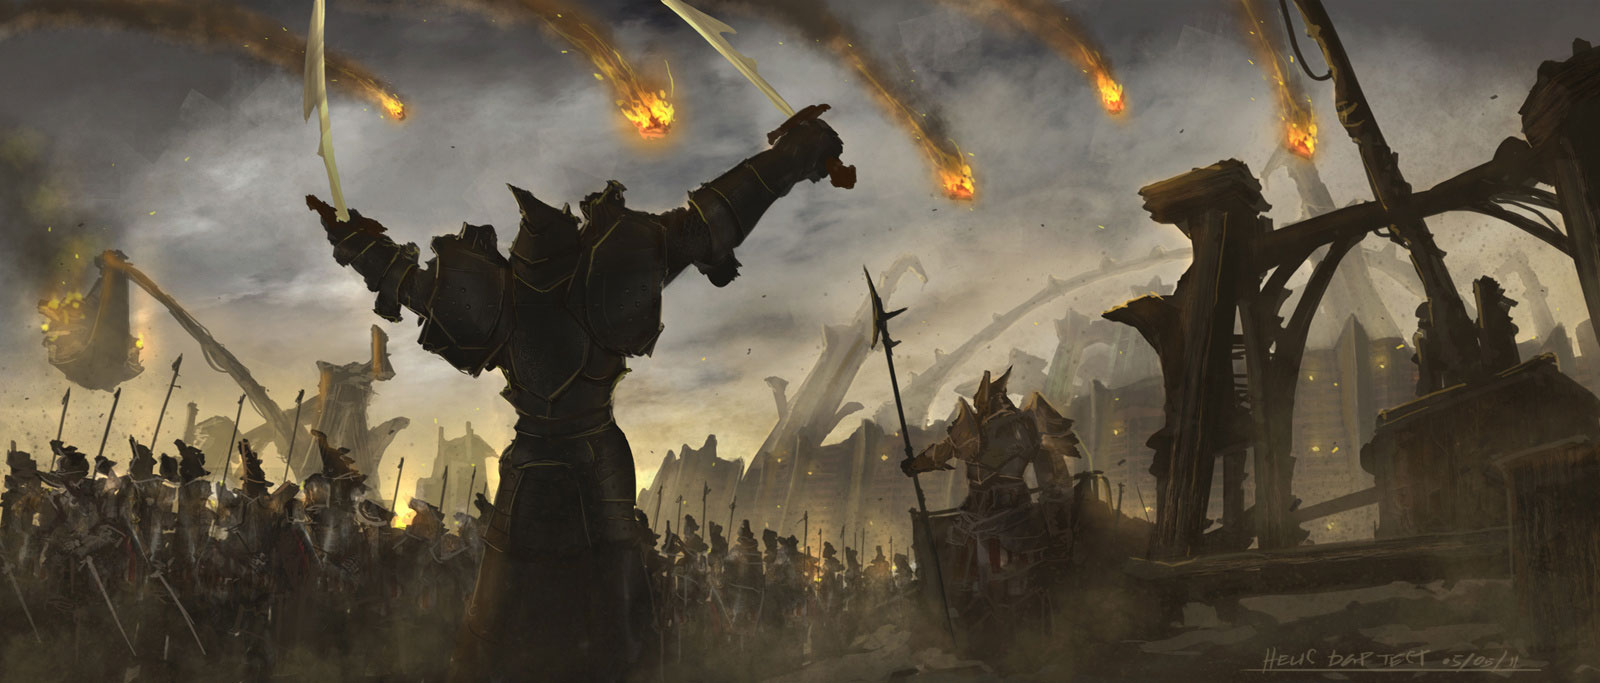 Epic Battle Scene Wallpaper  - Battle Scene